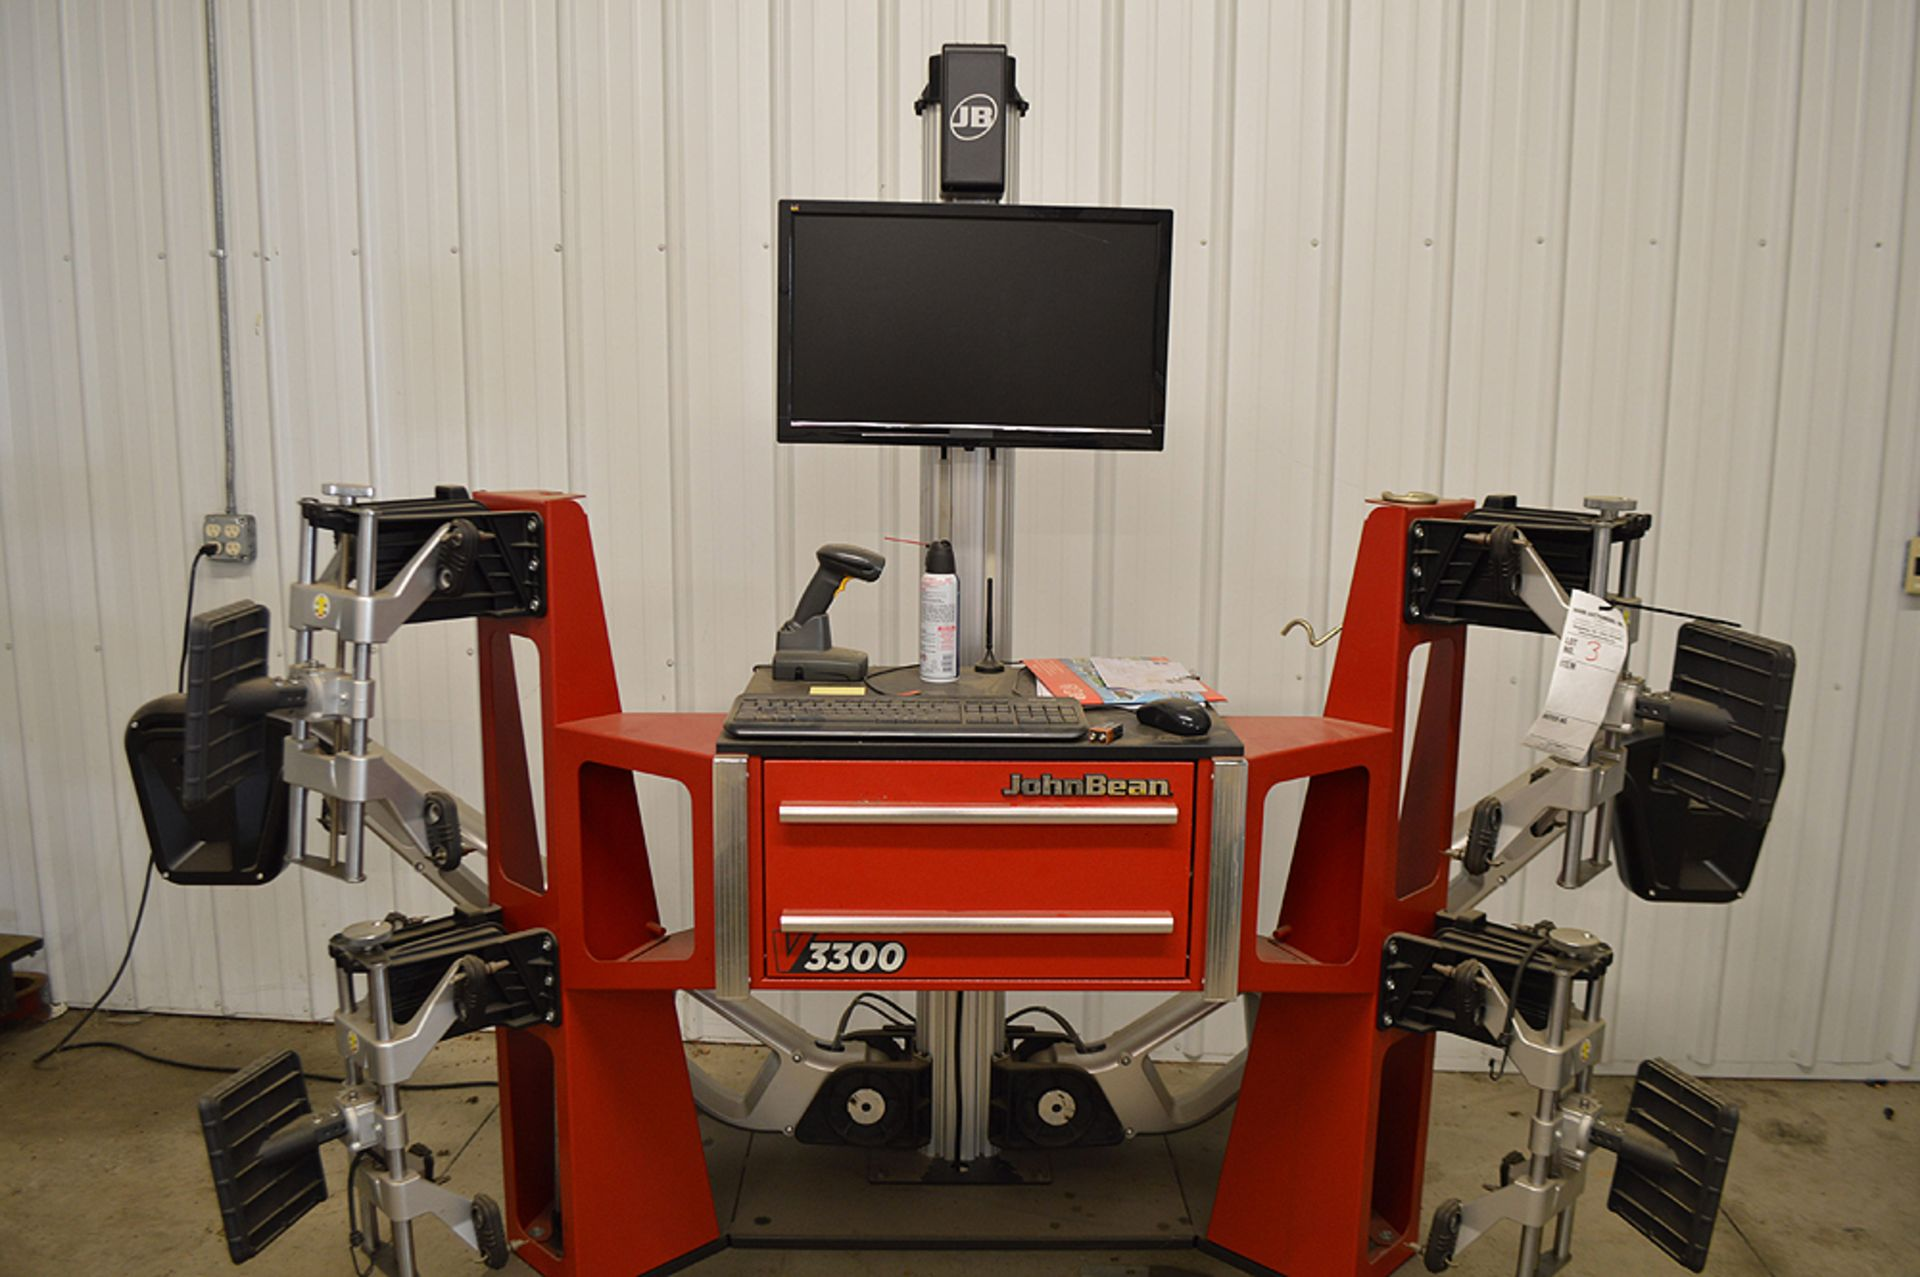 Lot 3 - JOHNBEAN V-3300 VEHICLE ALIGNMENT SYSTEM